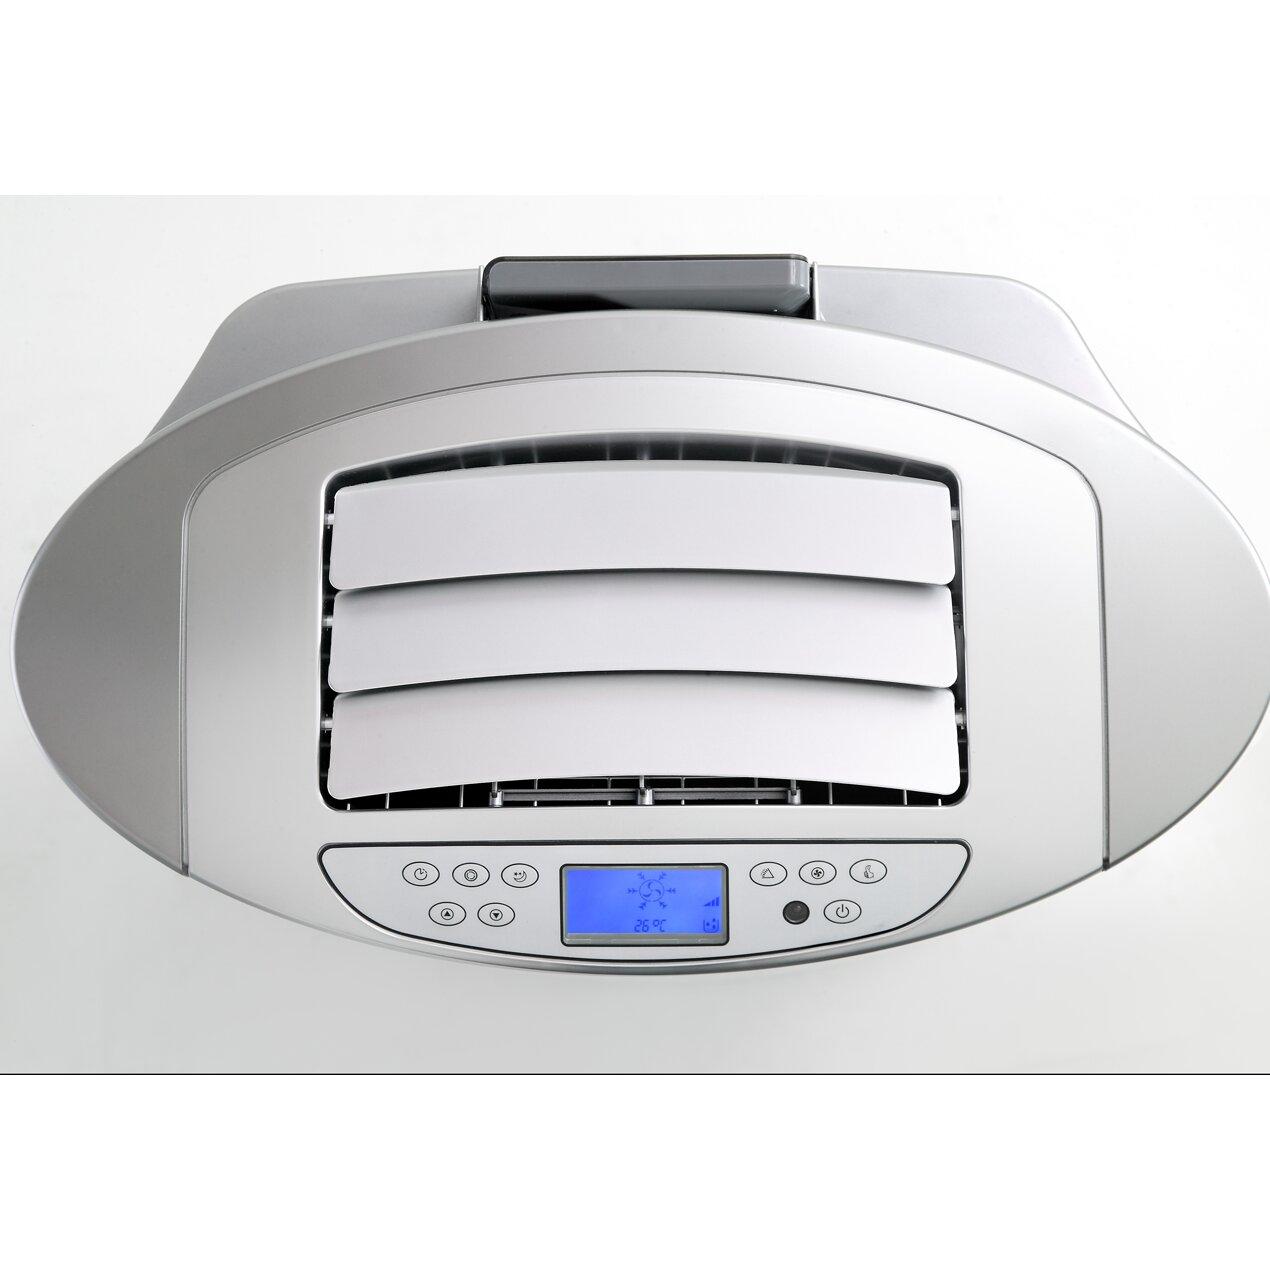 14000 BTU Portable Air Conditioner Wayfair Supply #0228C9